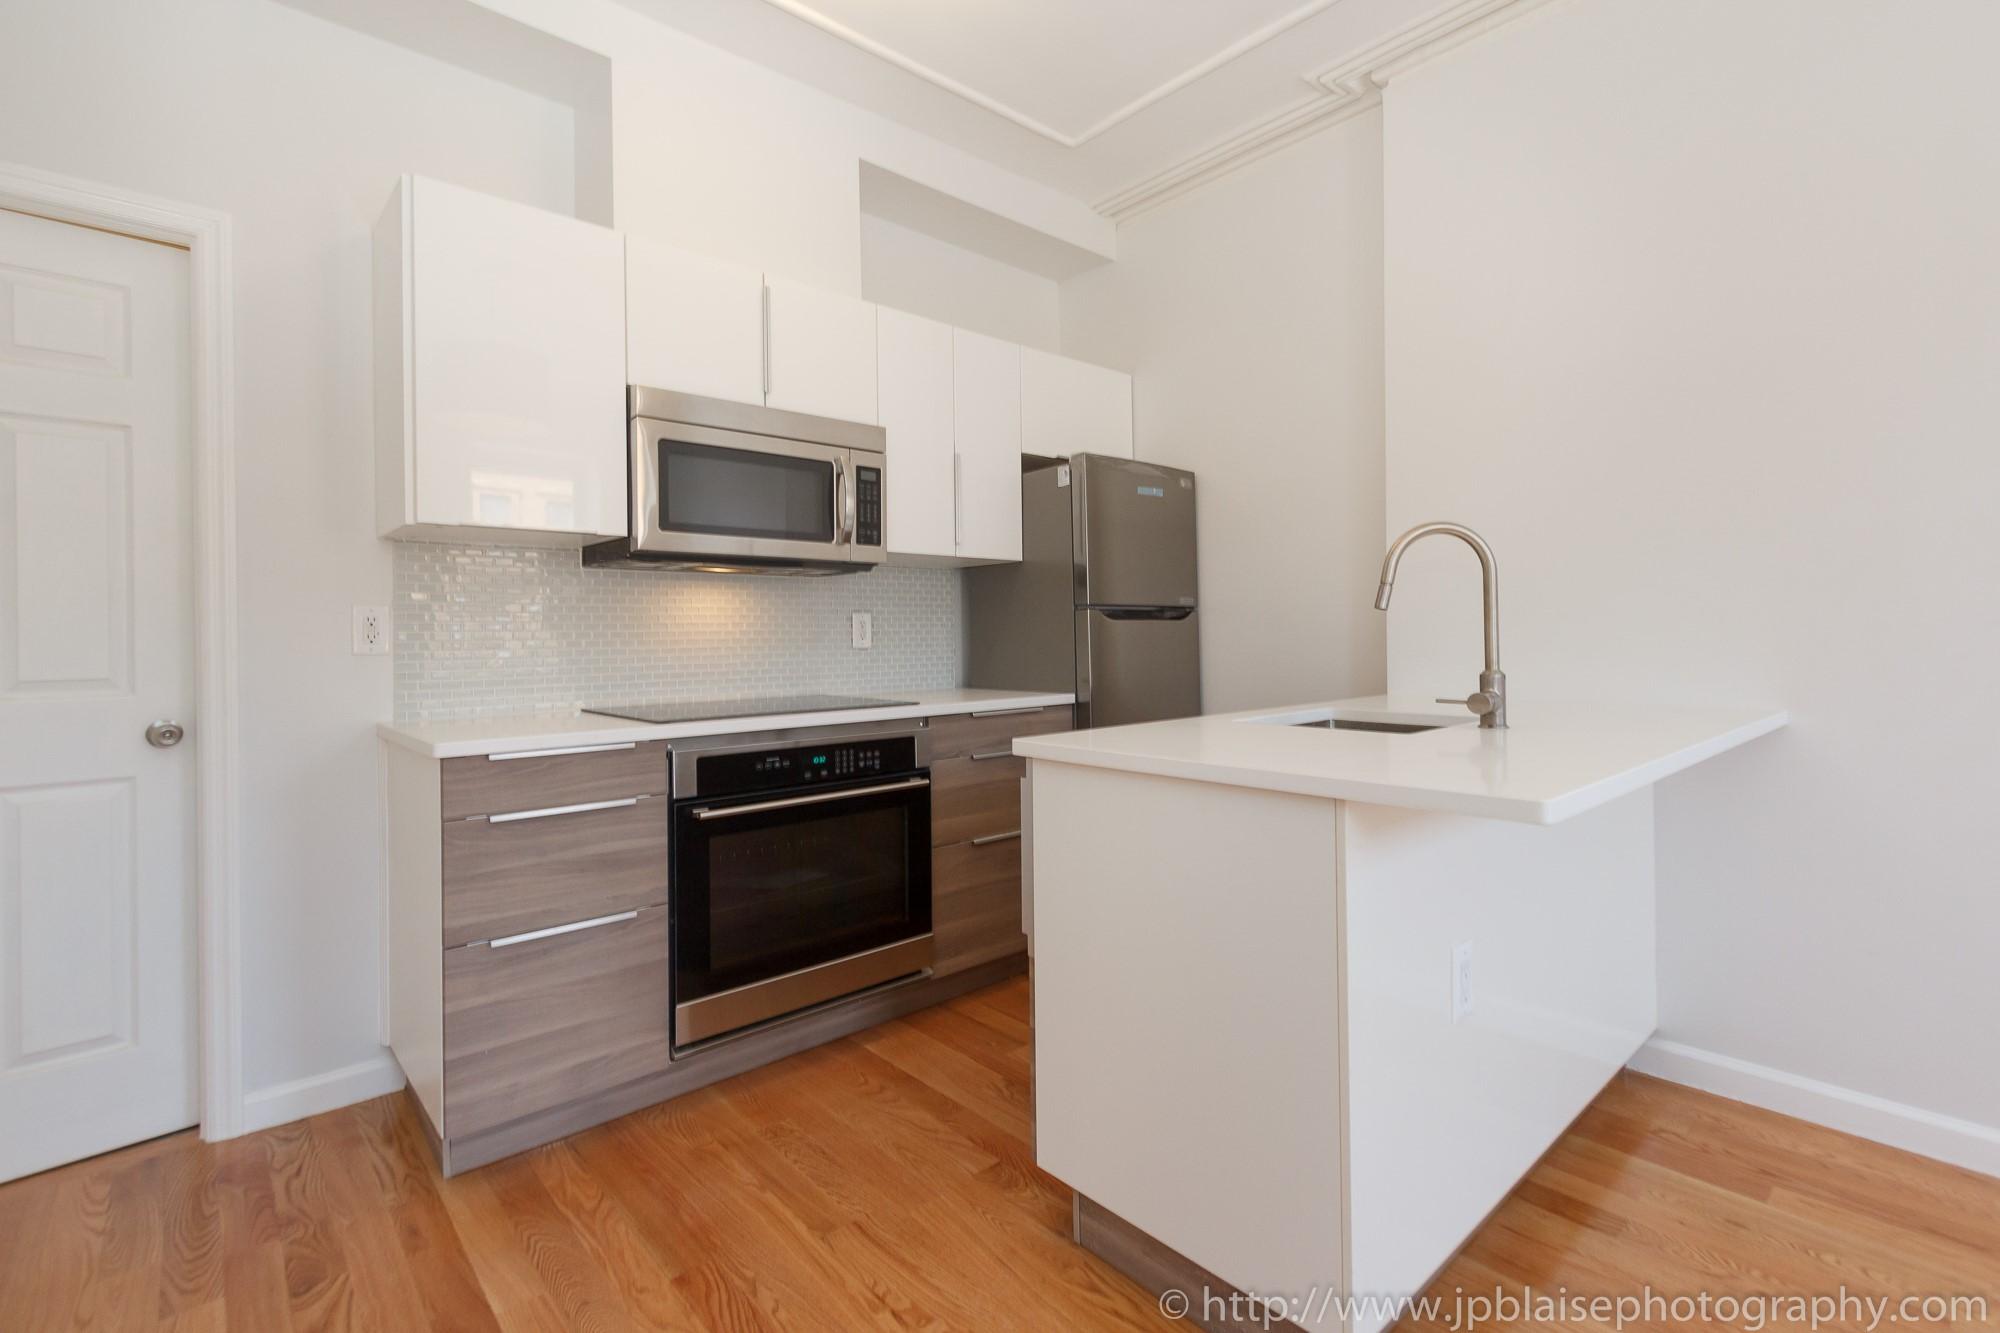 Brooklyn interior photography work one bedroom in bedford stuyvesant new york